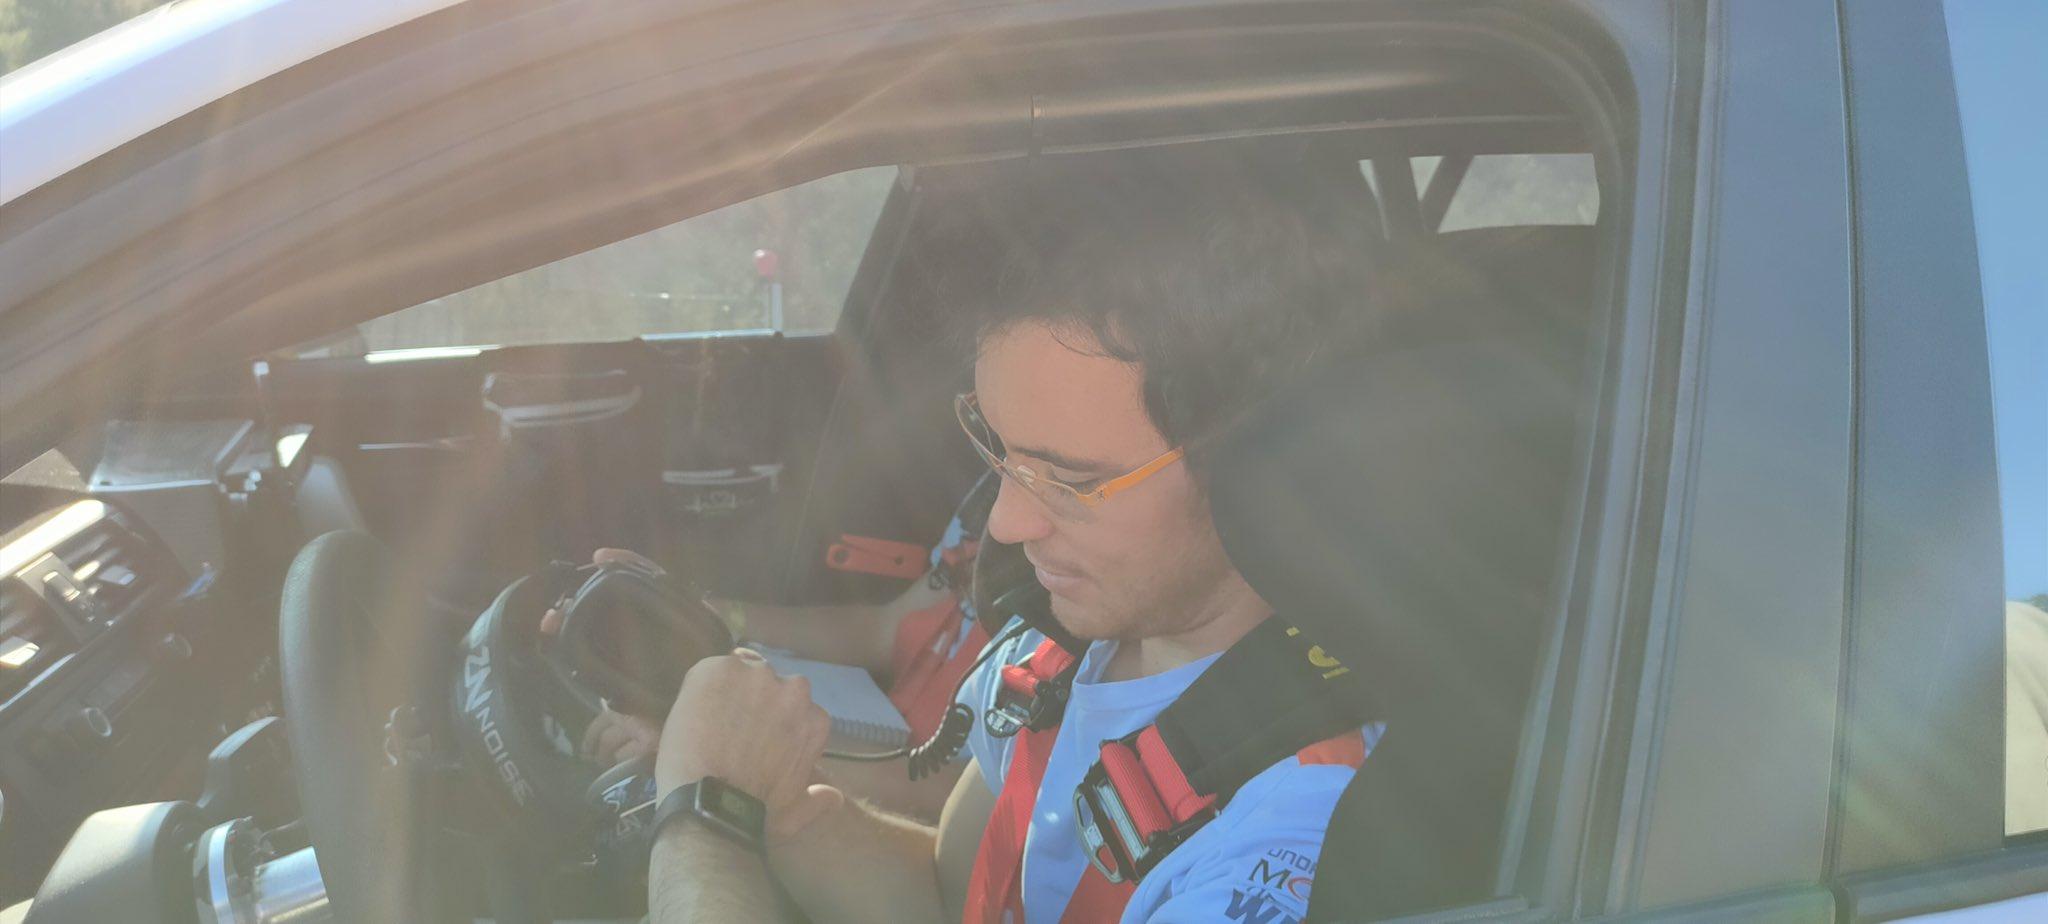 WRC: 56º RallyRACC Catalunya Costa Daurada - Rally de España [14-17 Octubre] - Página 2 FBfmxR3WUAsYCSd?format=jpg&name=large